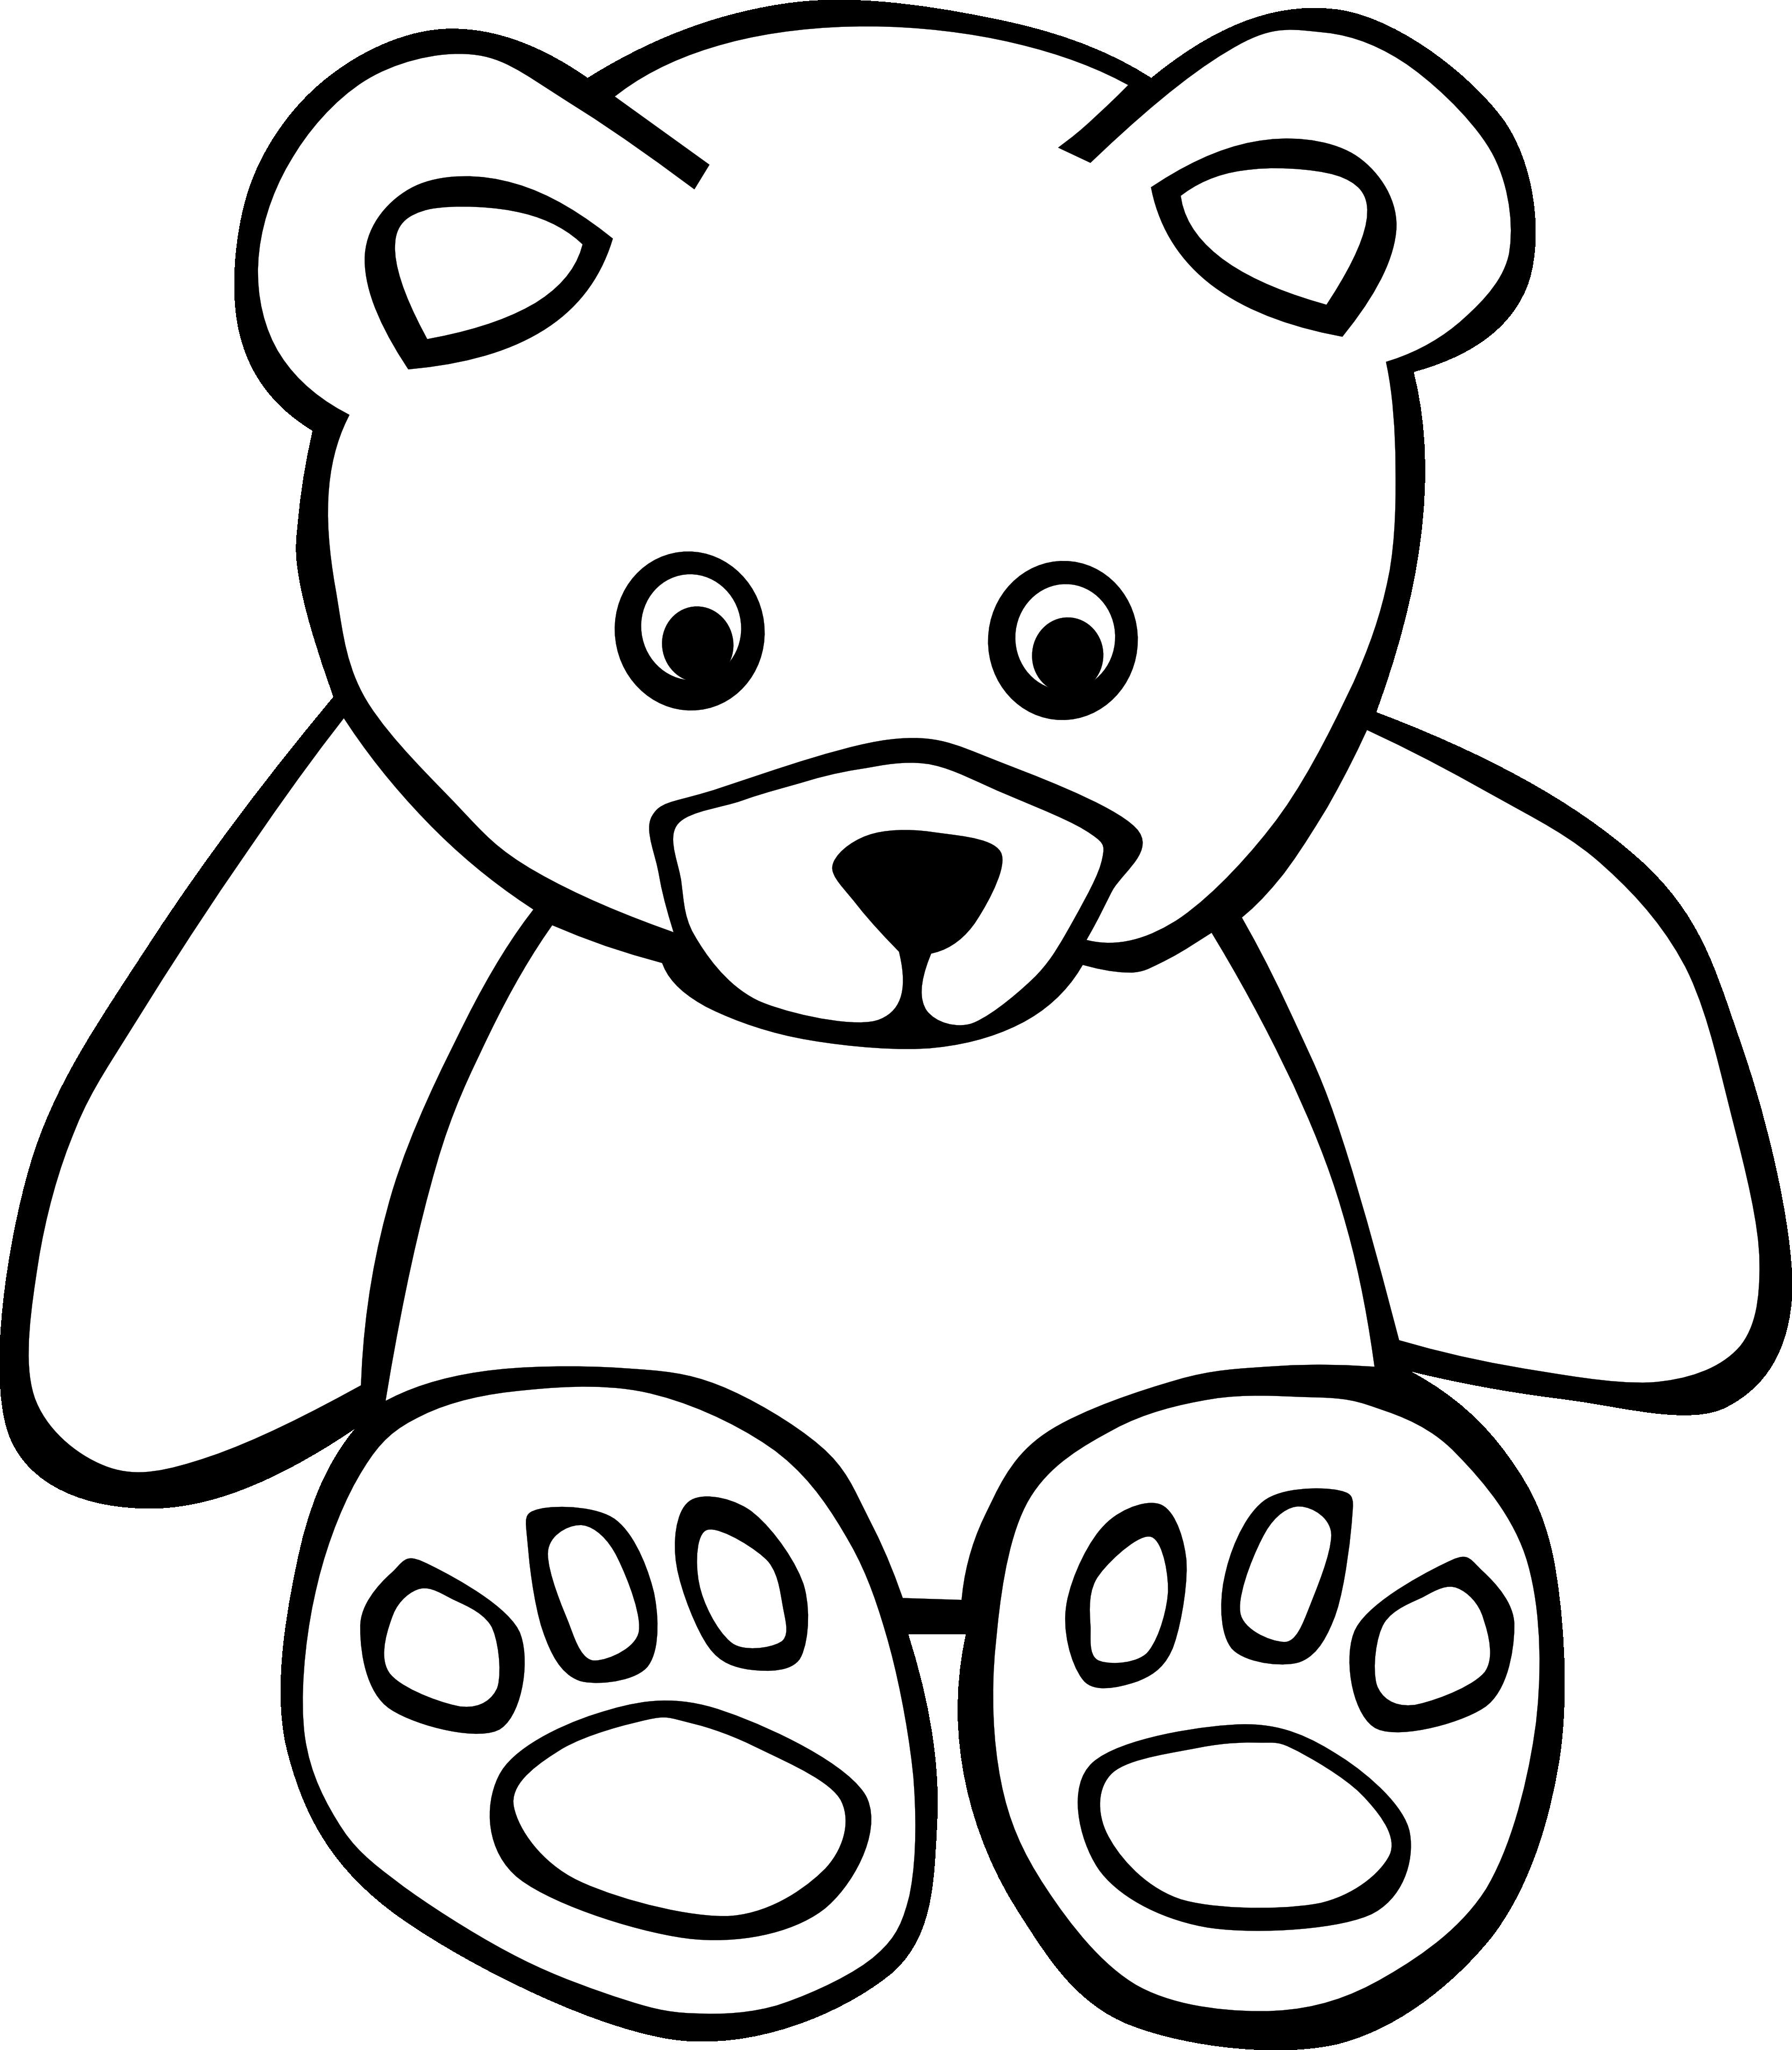 Black Bear Clipart U0026middot; Black Cl-Black Bear Clipart u0026middot; Black Clip Art u0026middot; Teddy Bear Clip Art-4